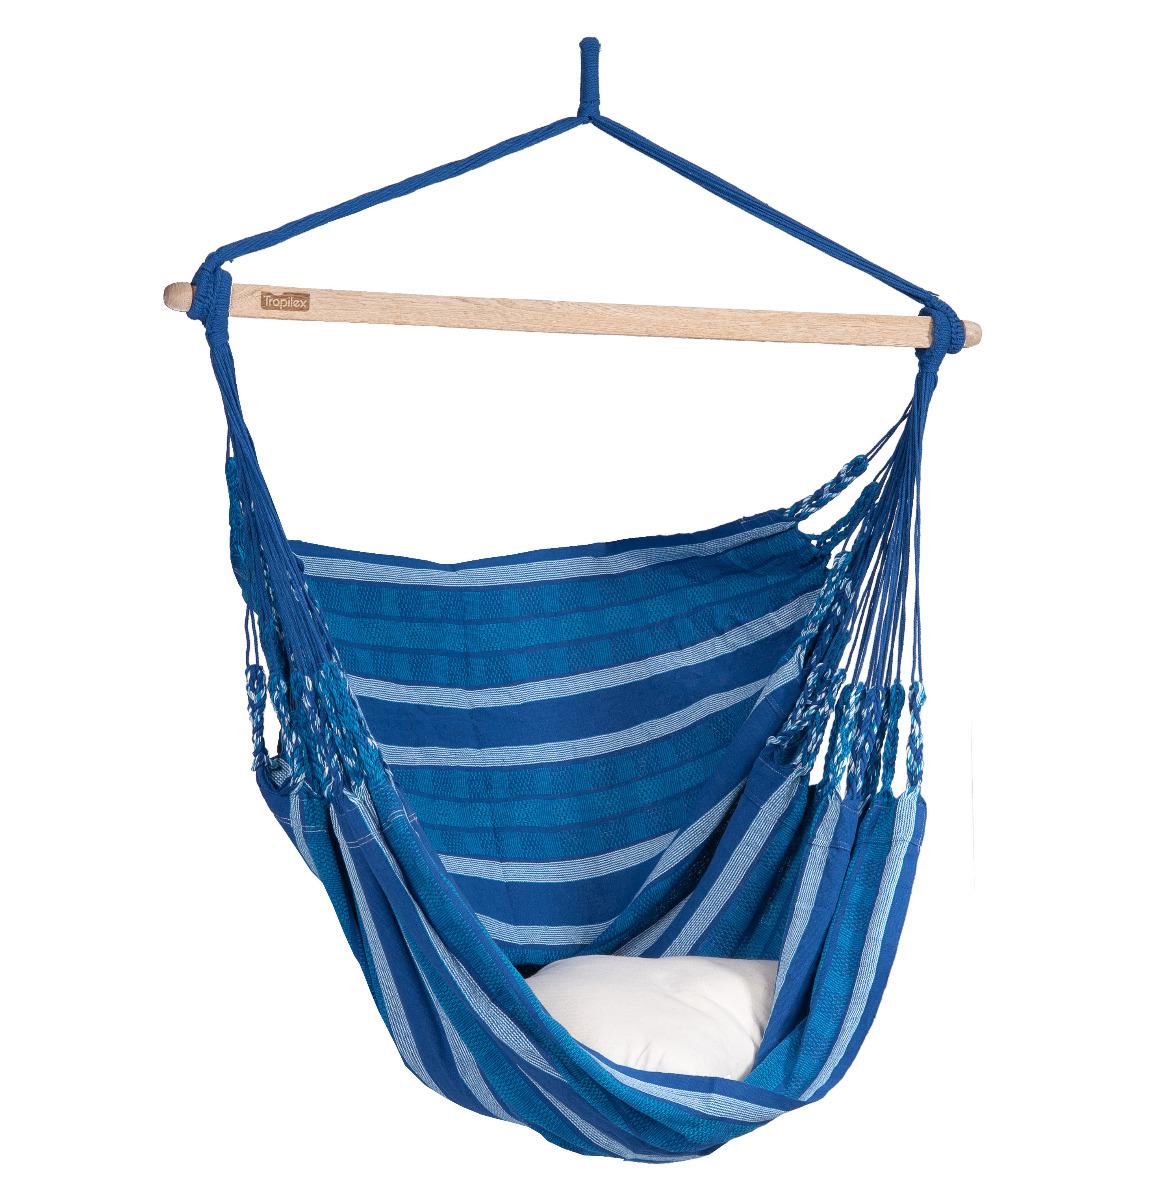 Hangstoel E�npersoons 'Chill' Calm - Blauw - Tropilex �